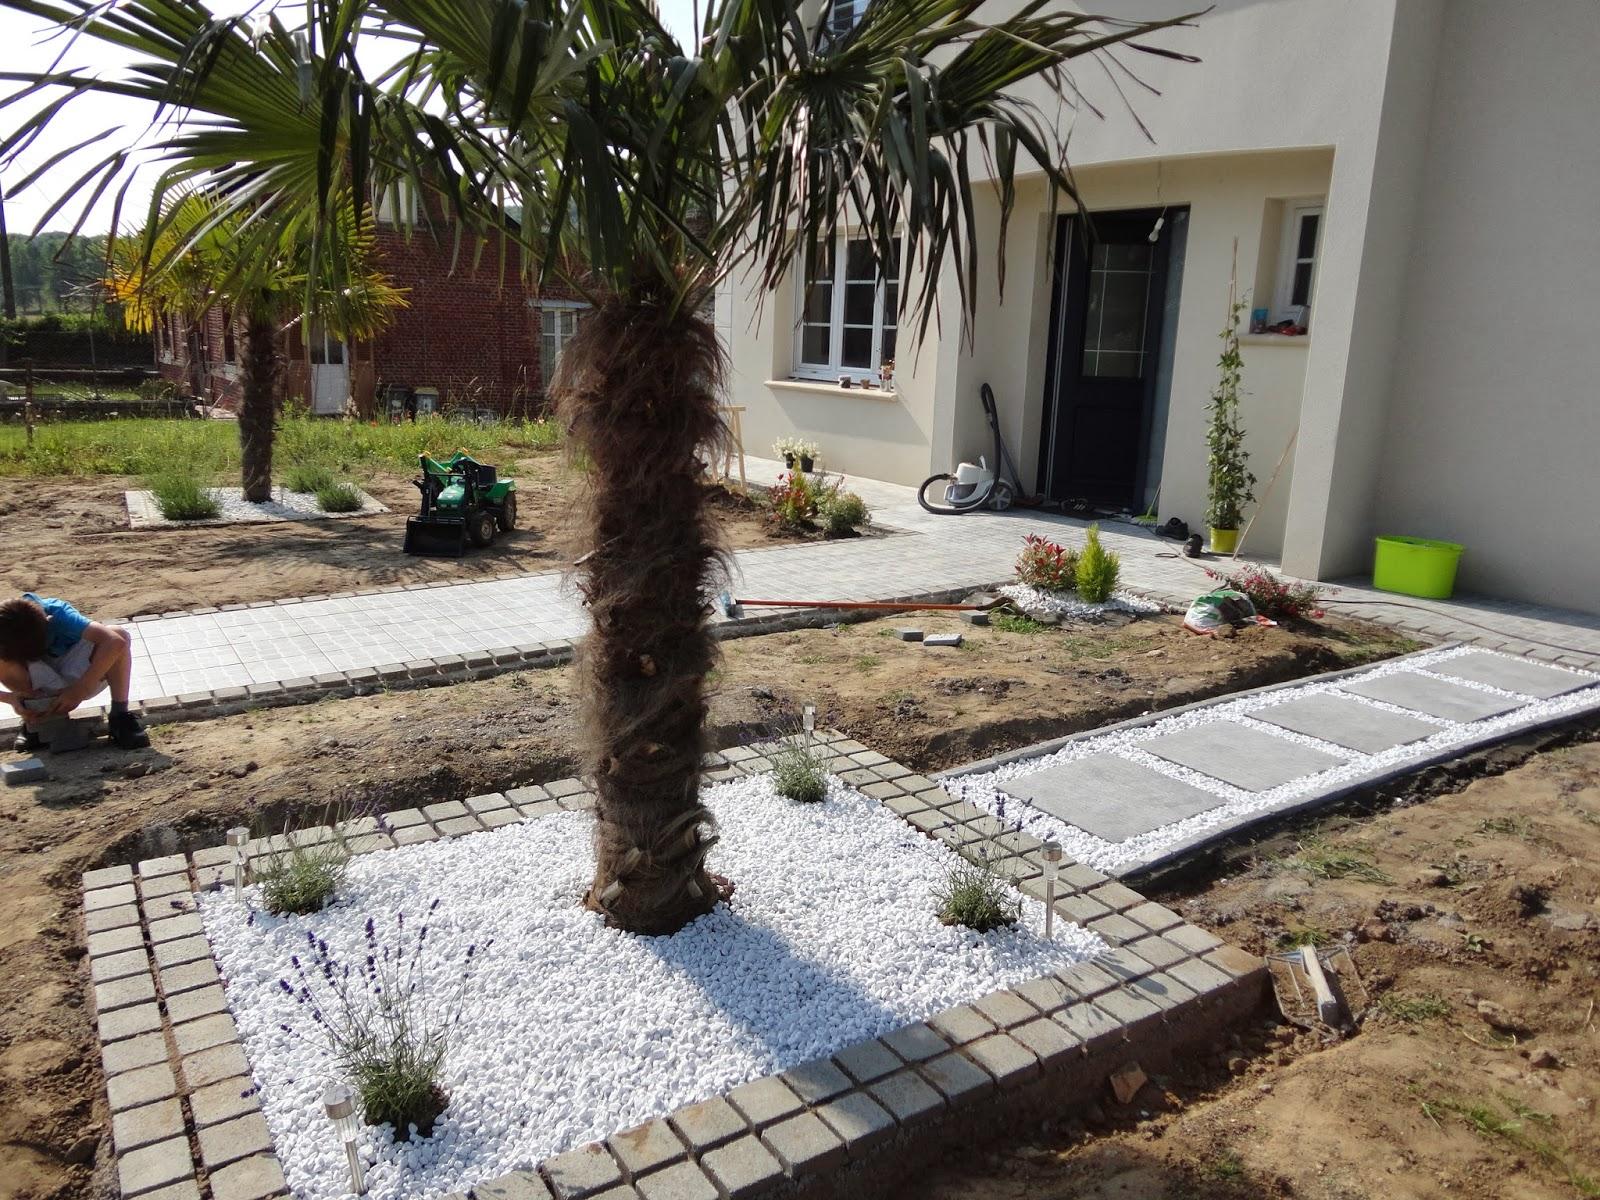 naissance d 39 un jardin une grande aventure mars 2014. Black Bedroom Furniture Sets. Home Design Ideas